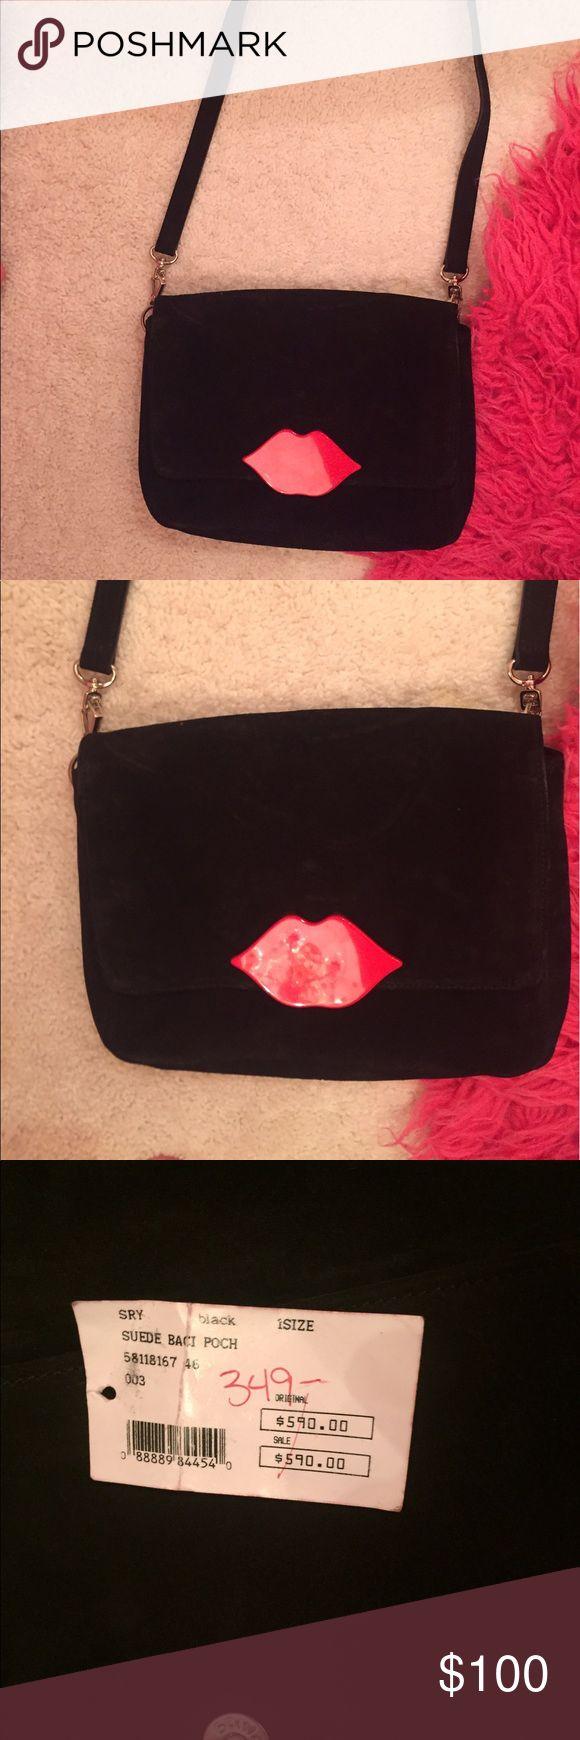 Sonia Rykel Lips Bag Purchased at Intermix Sonia Rykiel Bags Mini Bags